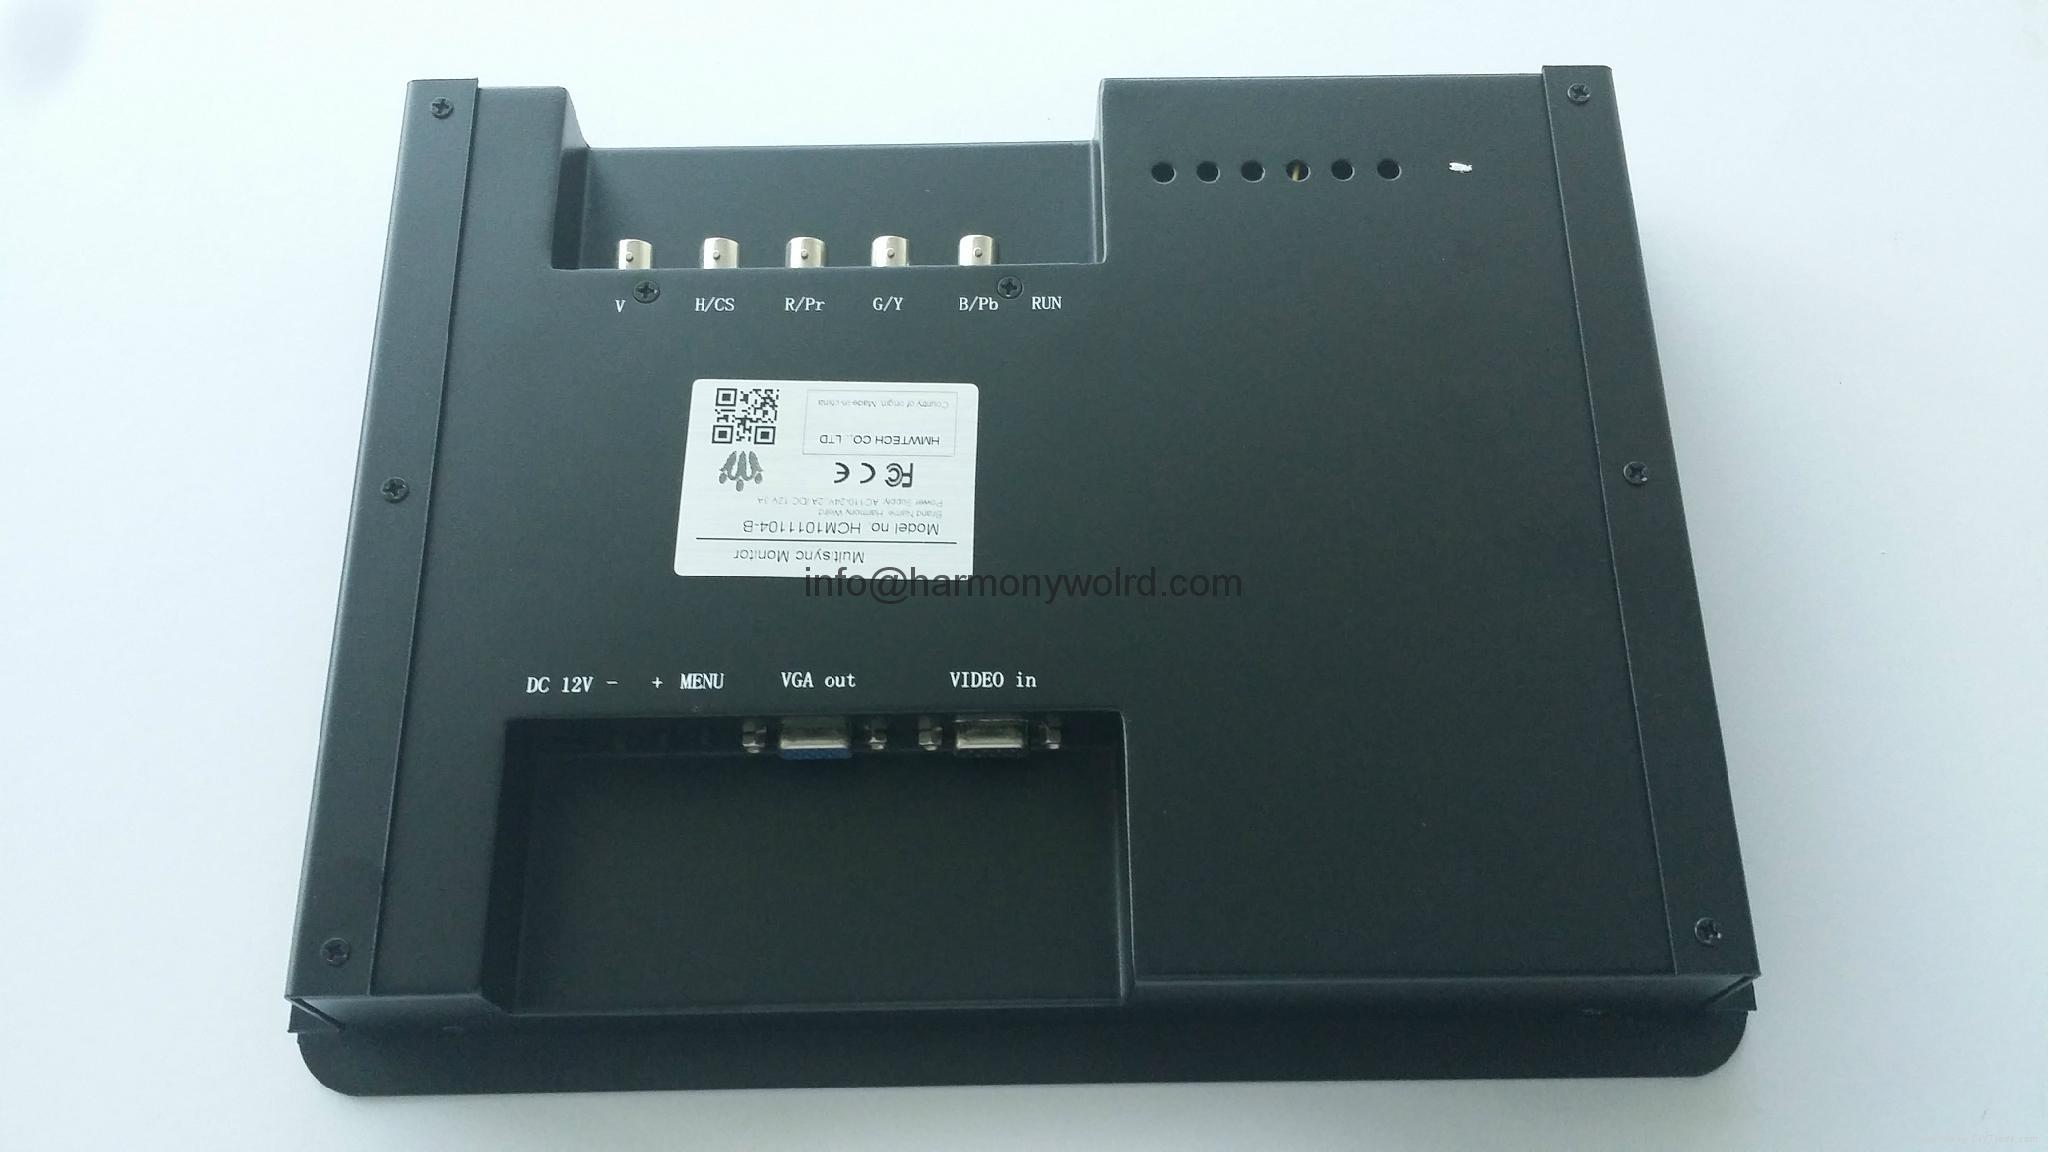 Upgrade Monitor For Okuma C12C-2455001 12 inch CRT to LCDs Okuma OSP5000 11